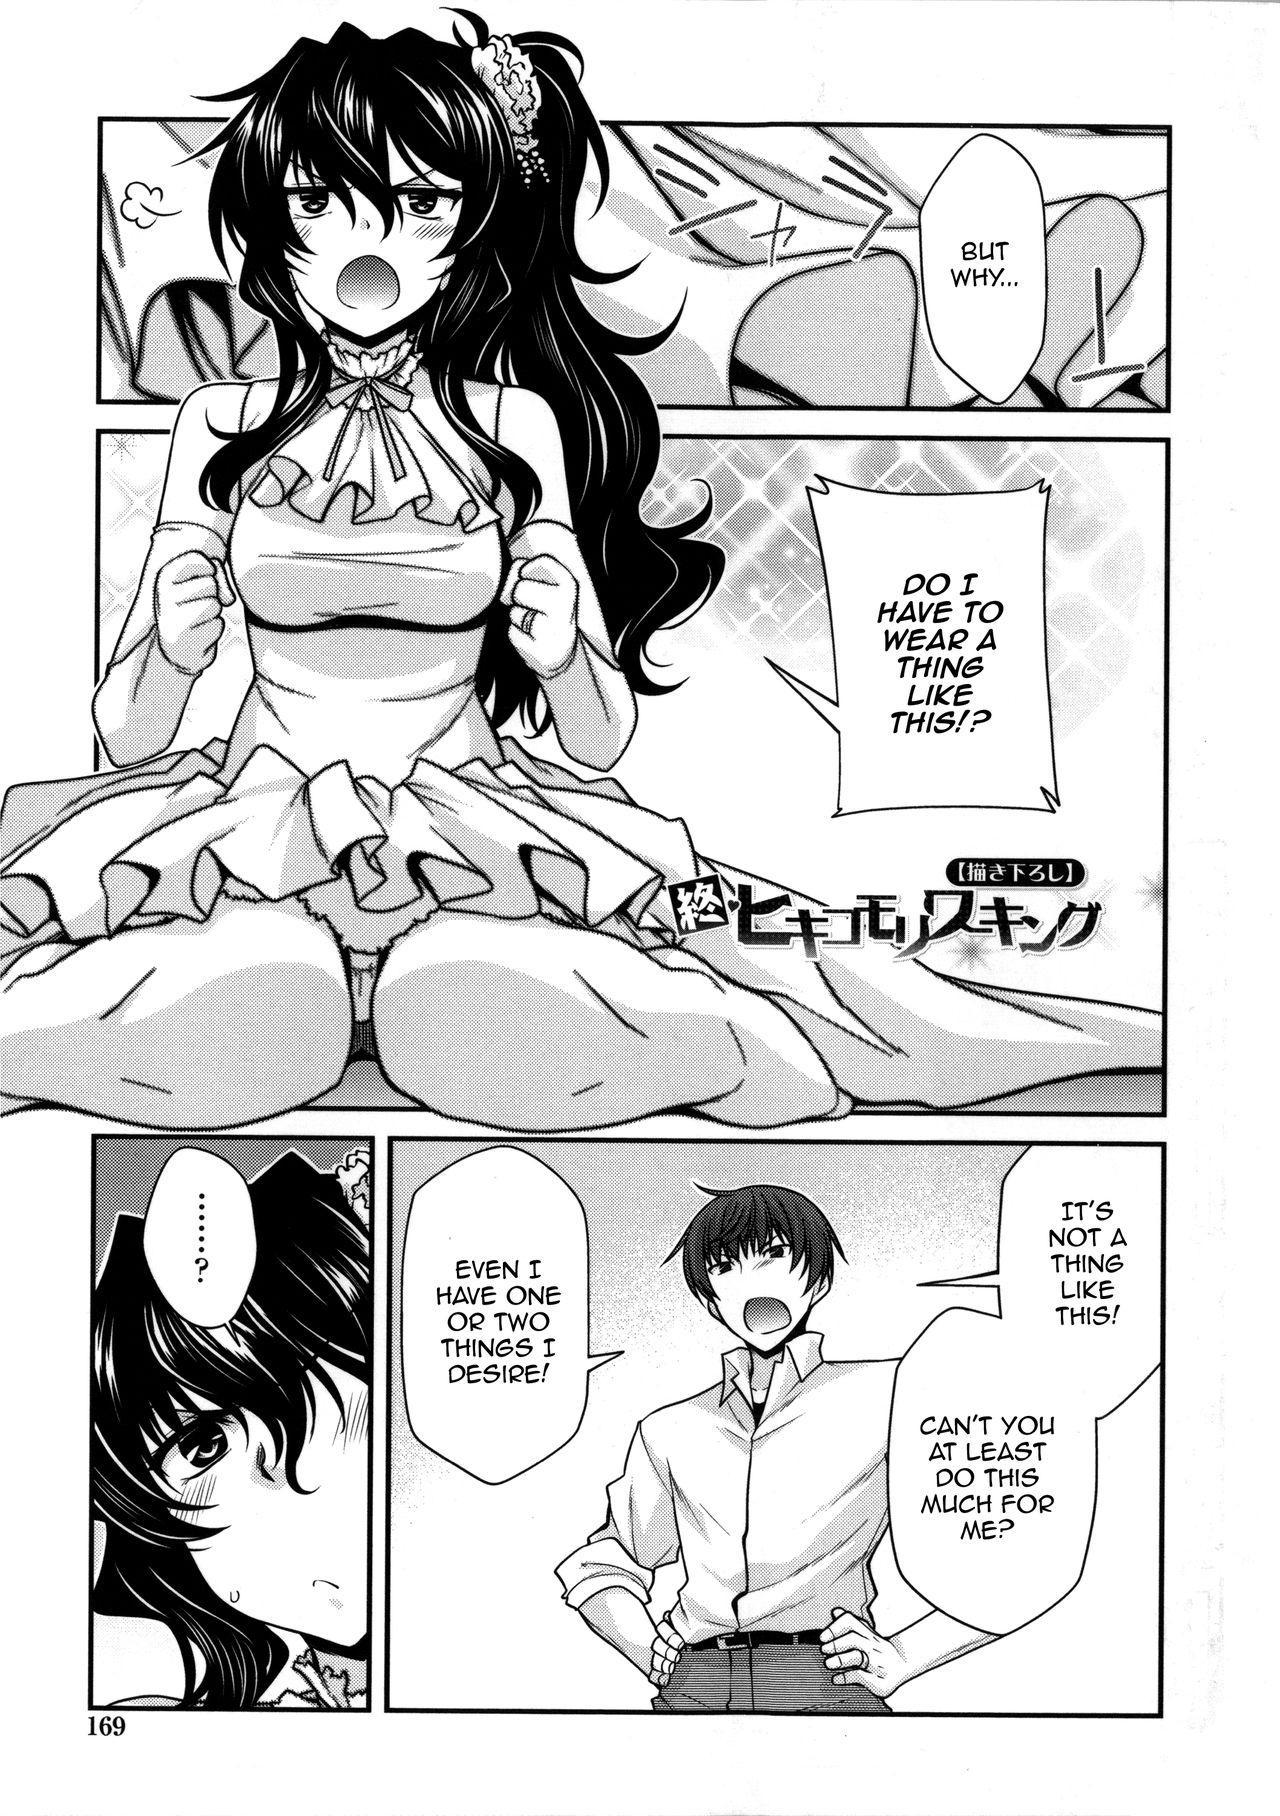 [Miyashiro Sousuke] Yamato Nadeshiko Chichi Henge - Yamato Nadeshiko Breast Changes Ch. 0-1, 4-5, 7-9 [English] 104